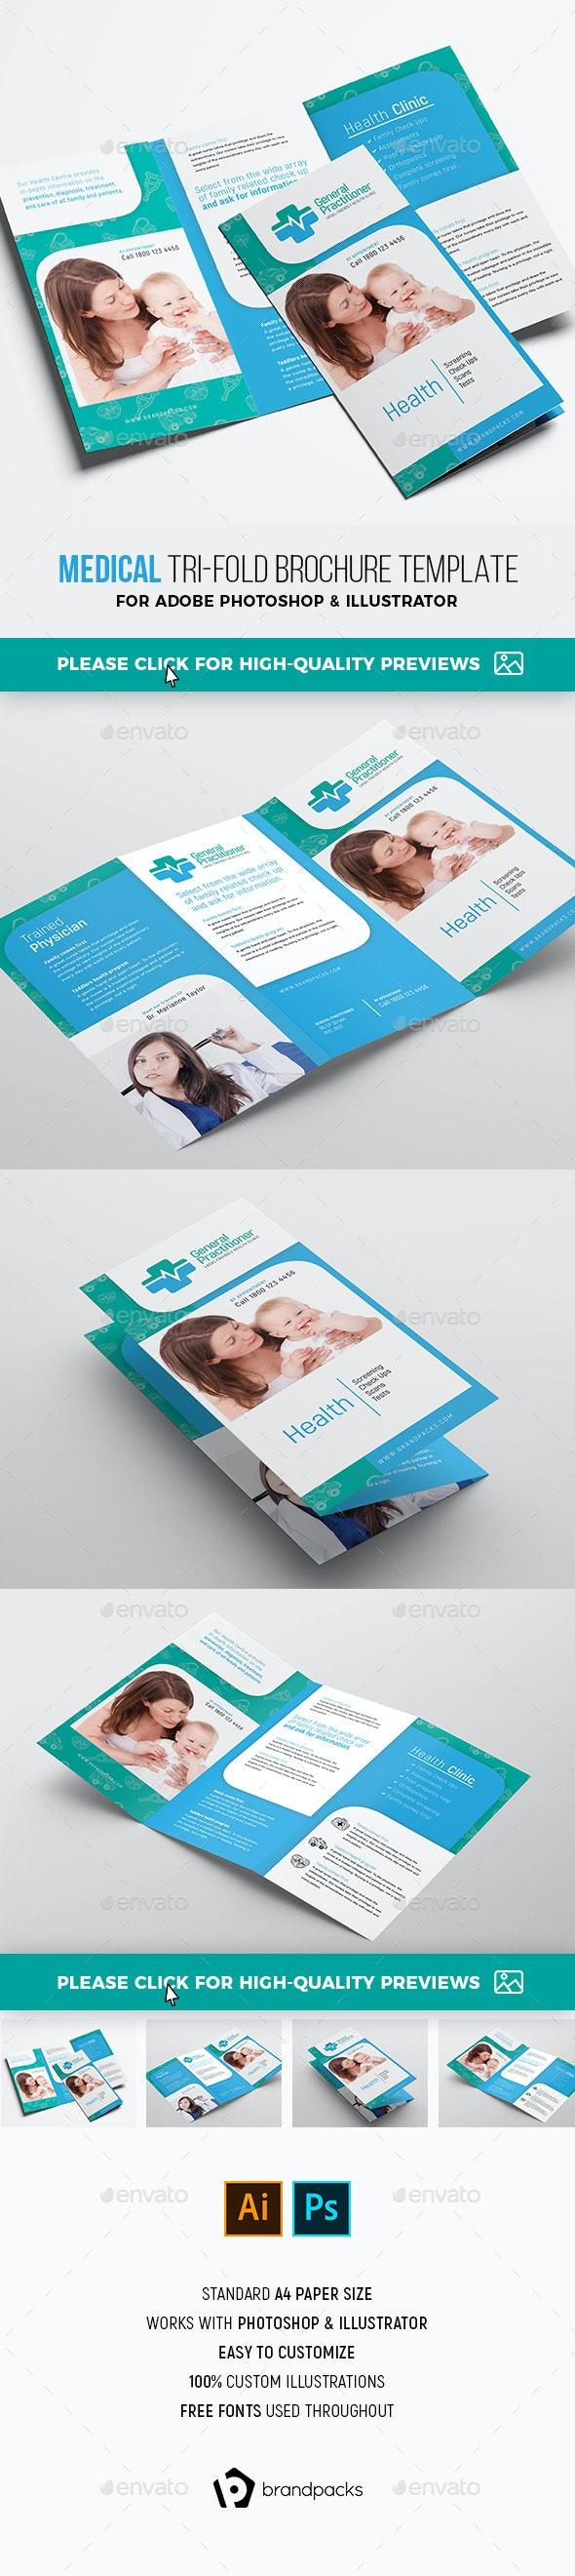 Medical Tri-fold Brochure Template - Corporate Brochures